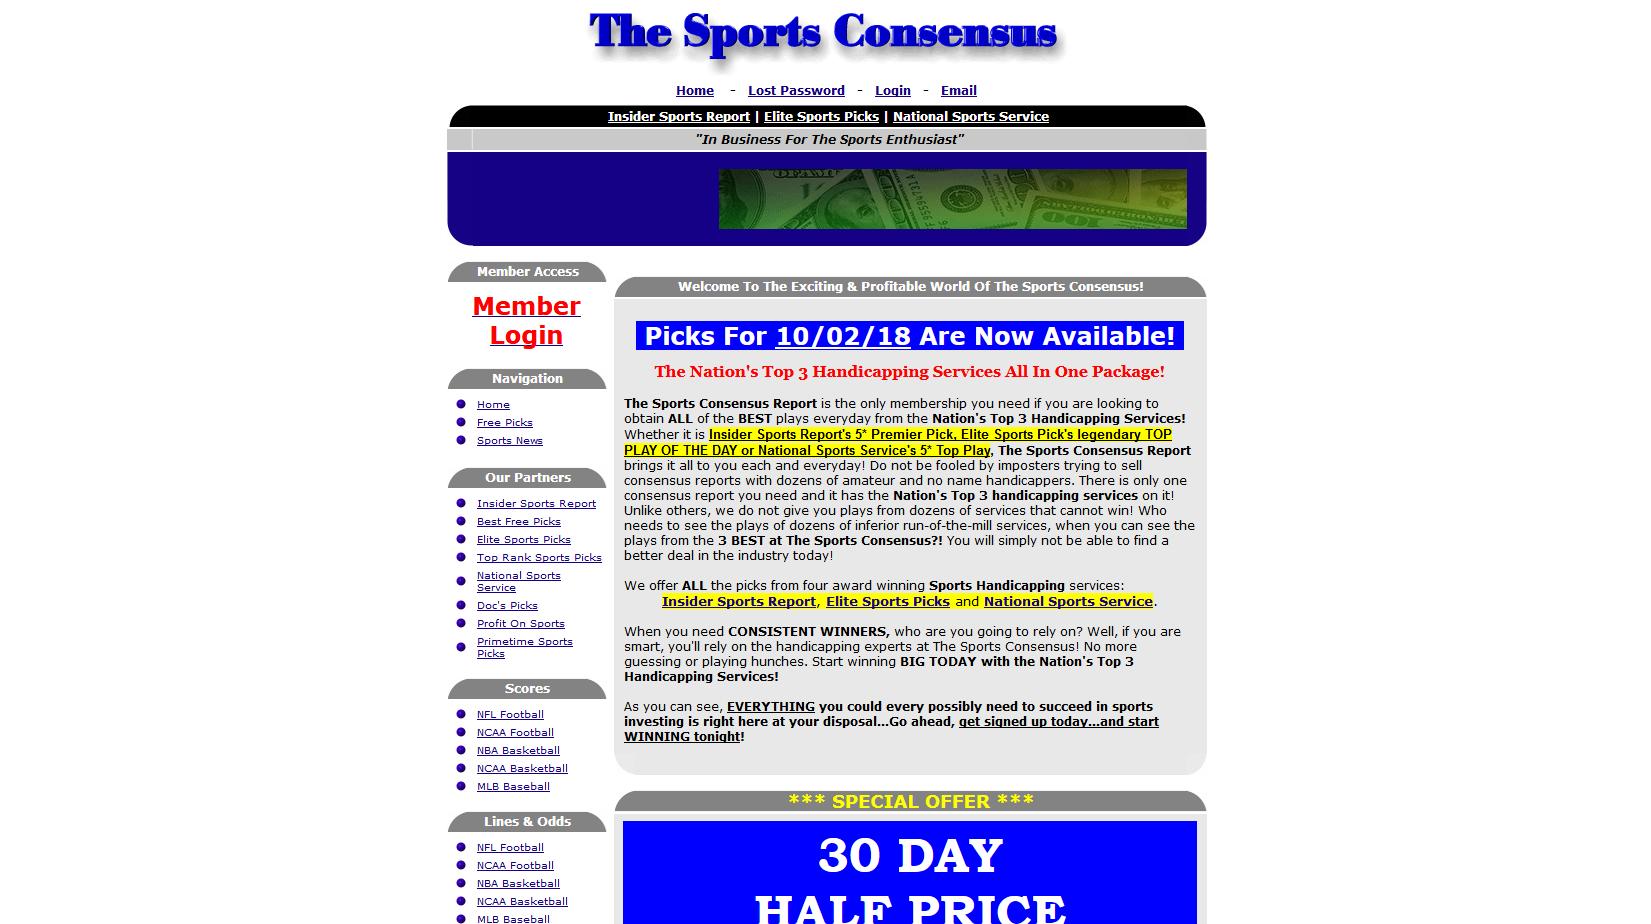 The Sports Consensus